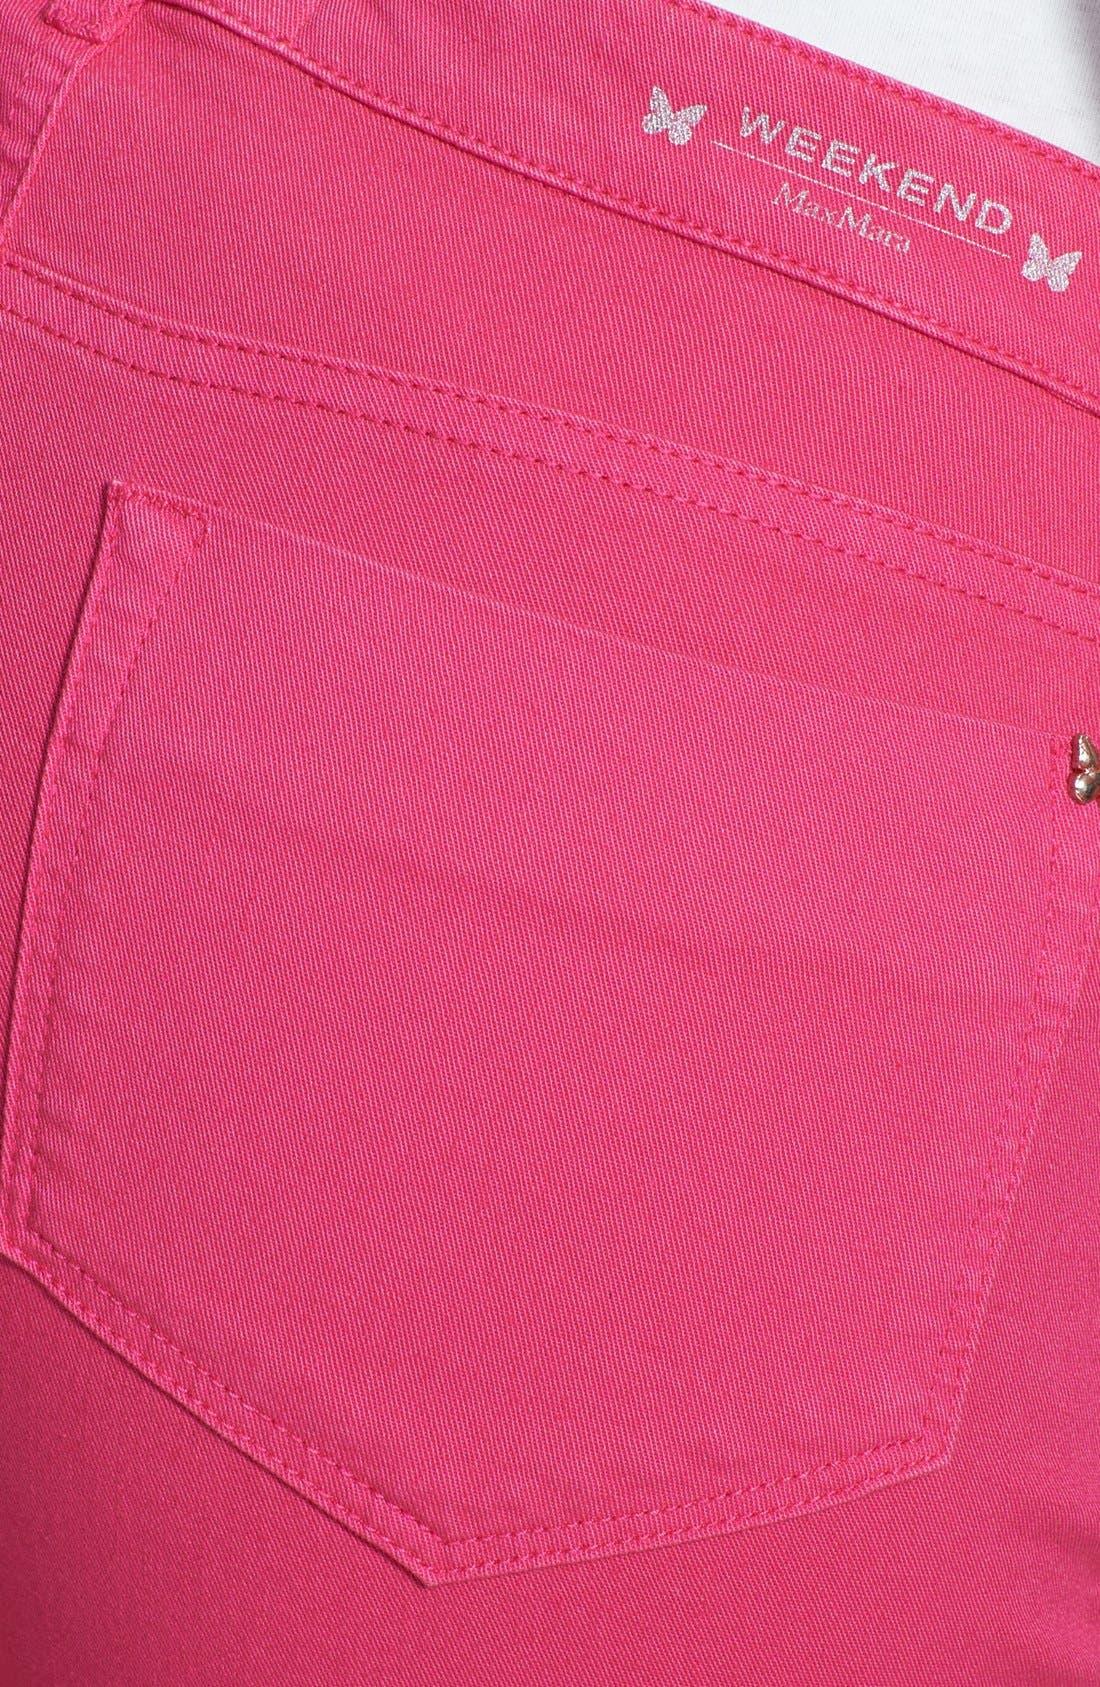 Alternate Image 3  - Weekend Max Mara 'Gitano' Stretch Cotton Pants